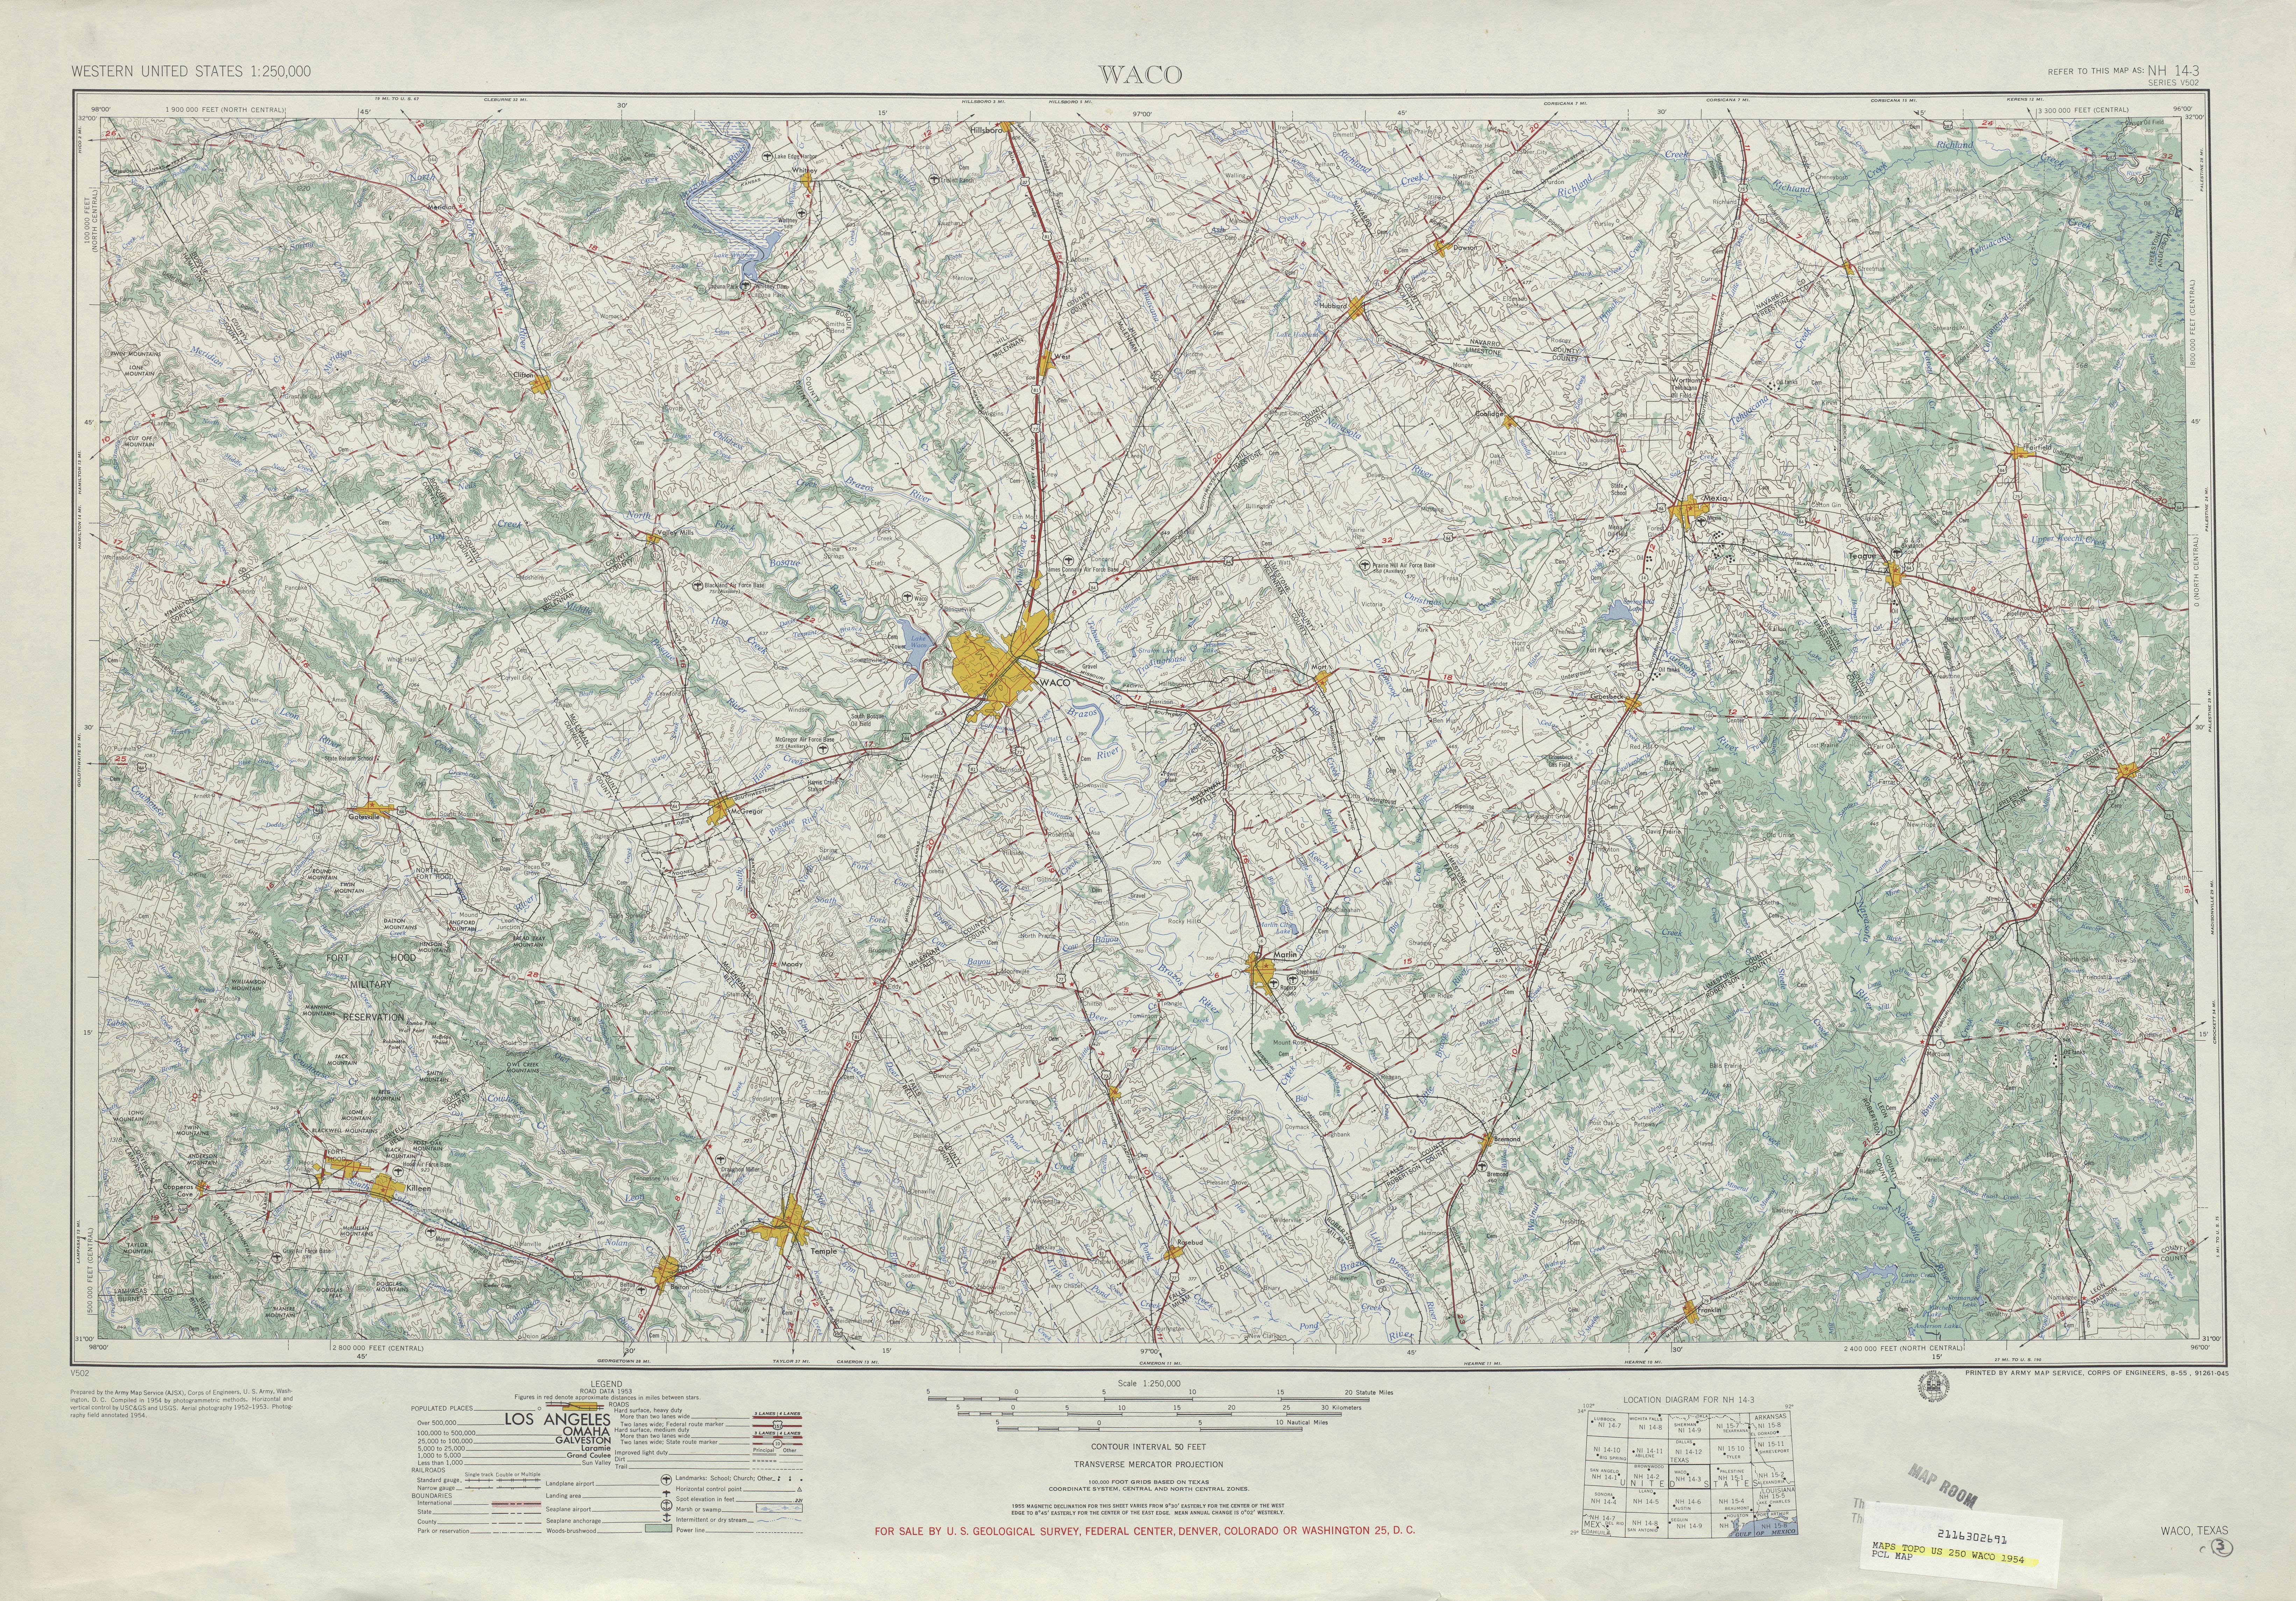 Texas Topographic Maps PerryCastañeda Map Collection UT - John wallis map of the us